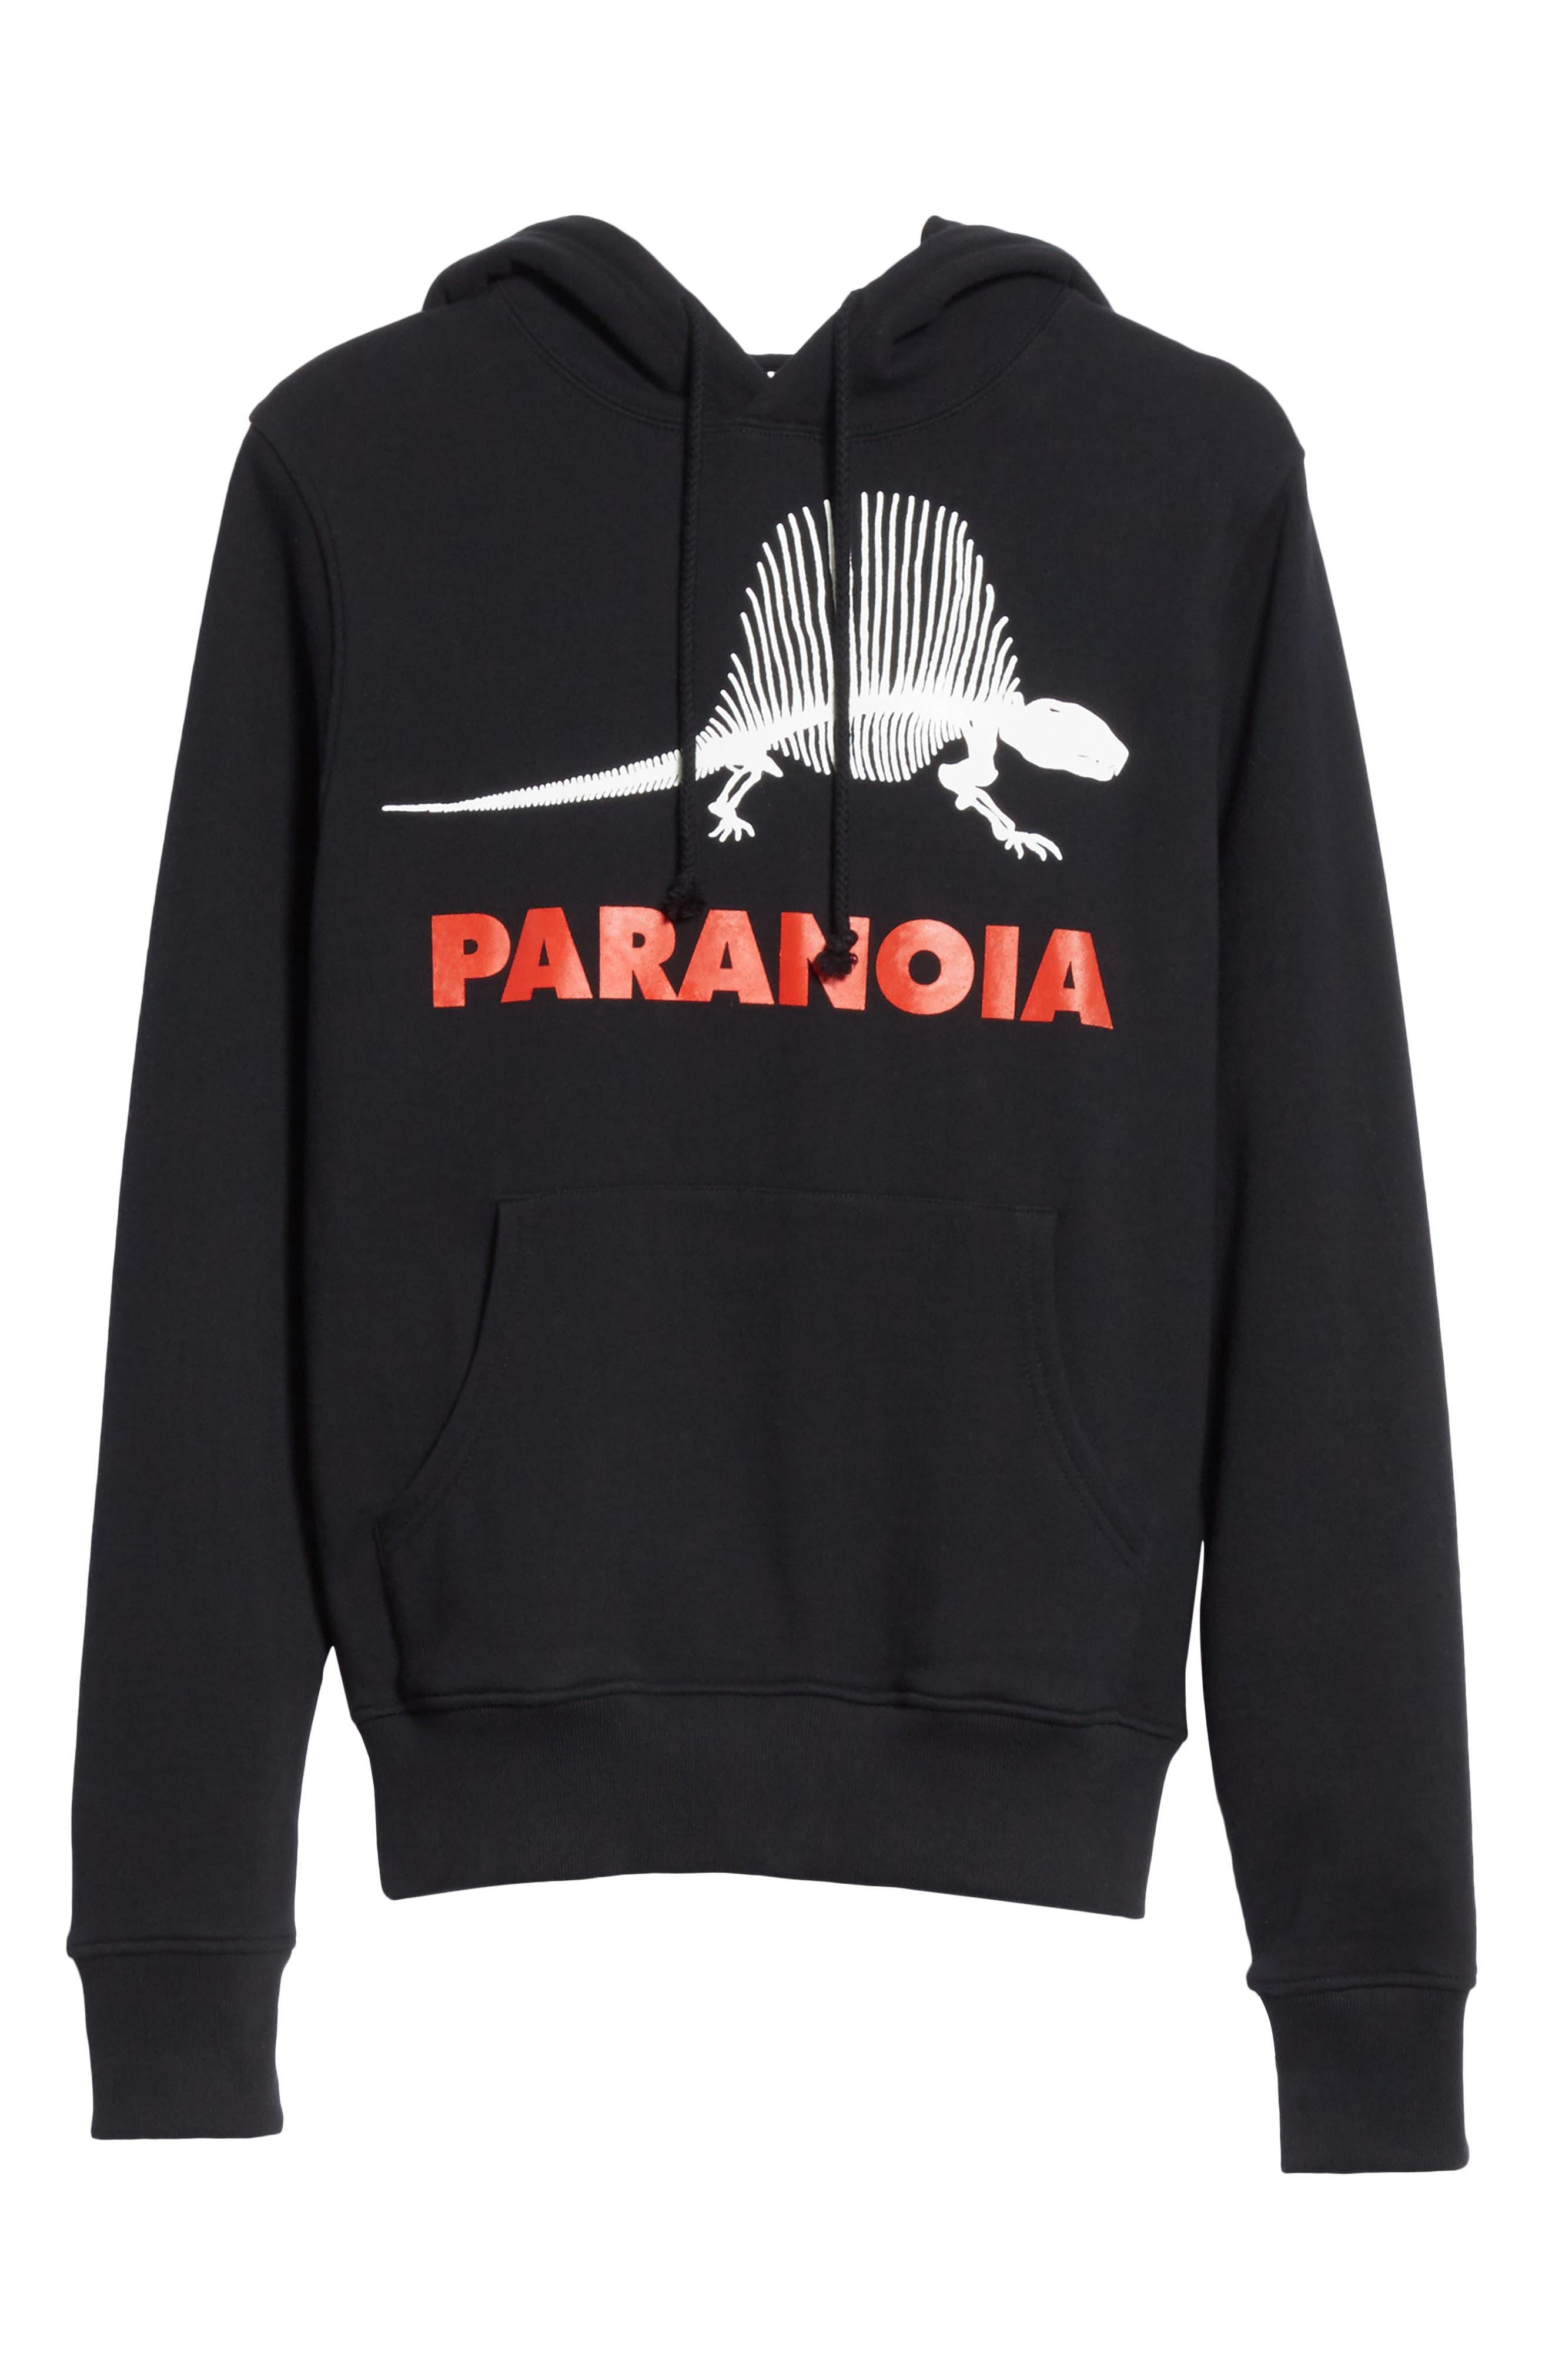 Paranoia Hoodie,                             Alternate thumbnail 6, color,                             Black